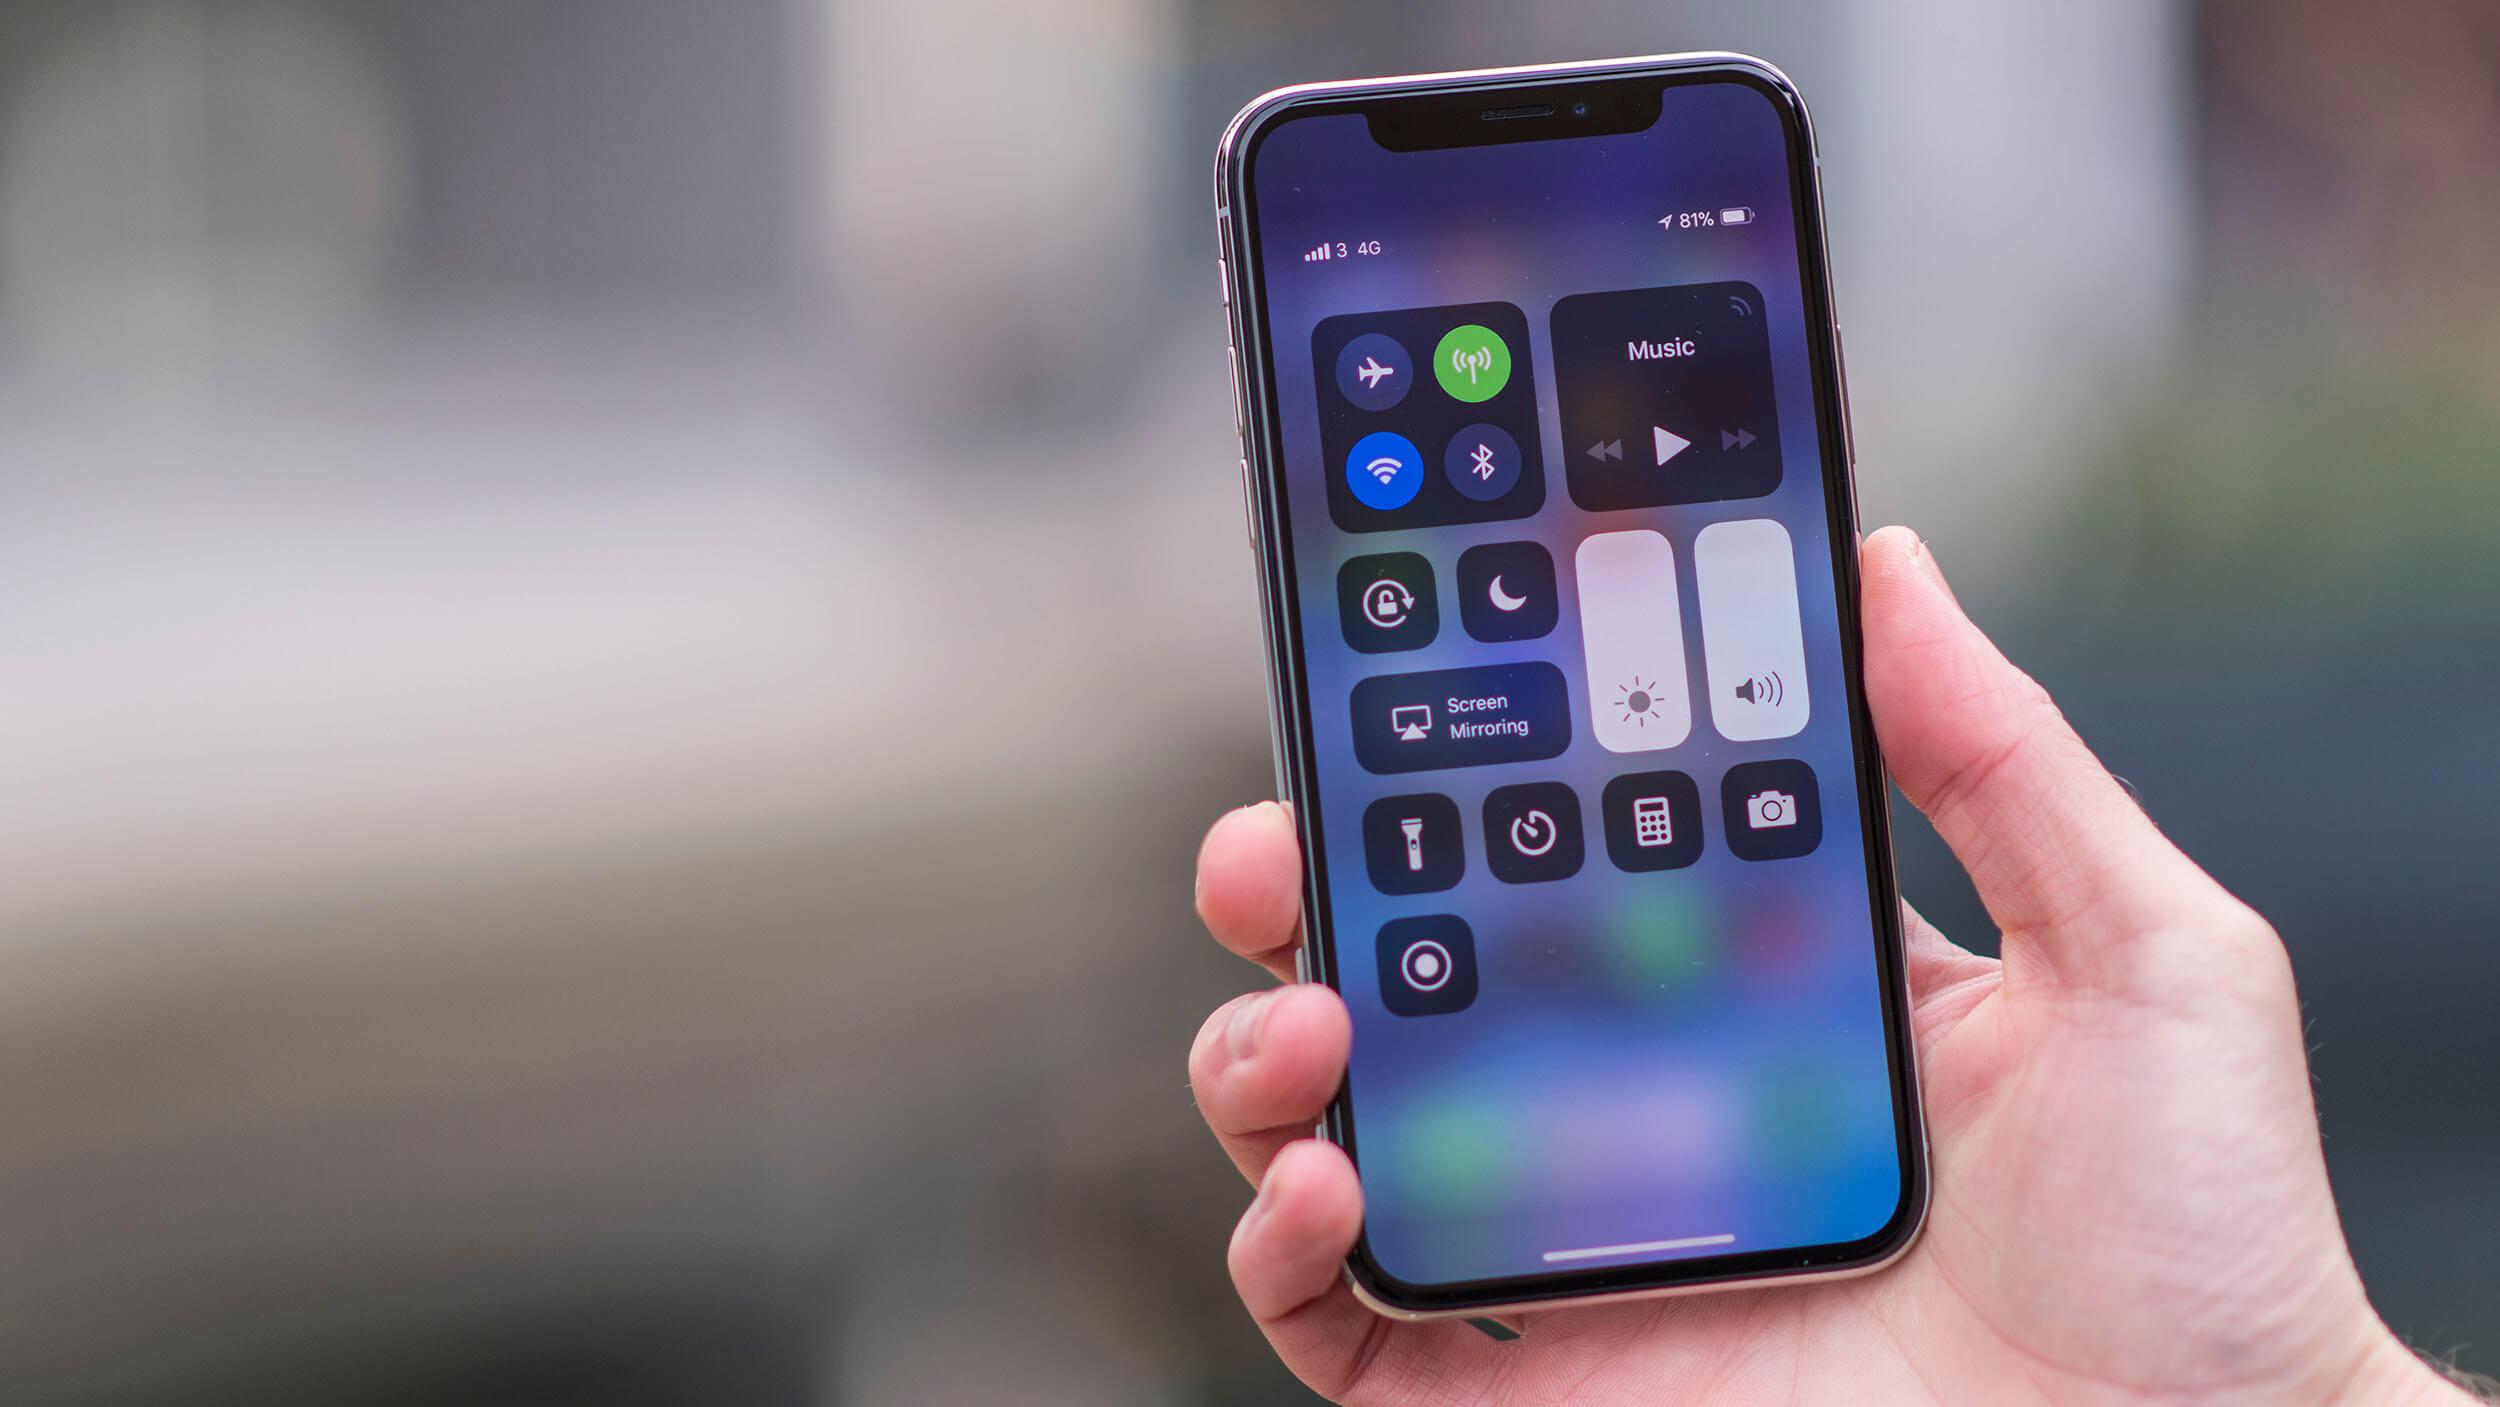 Apple представит новые iPhone 12 сентября. Прием предзаказов — с 14-го